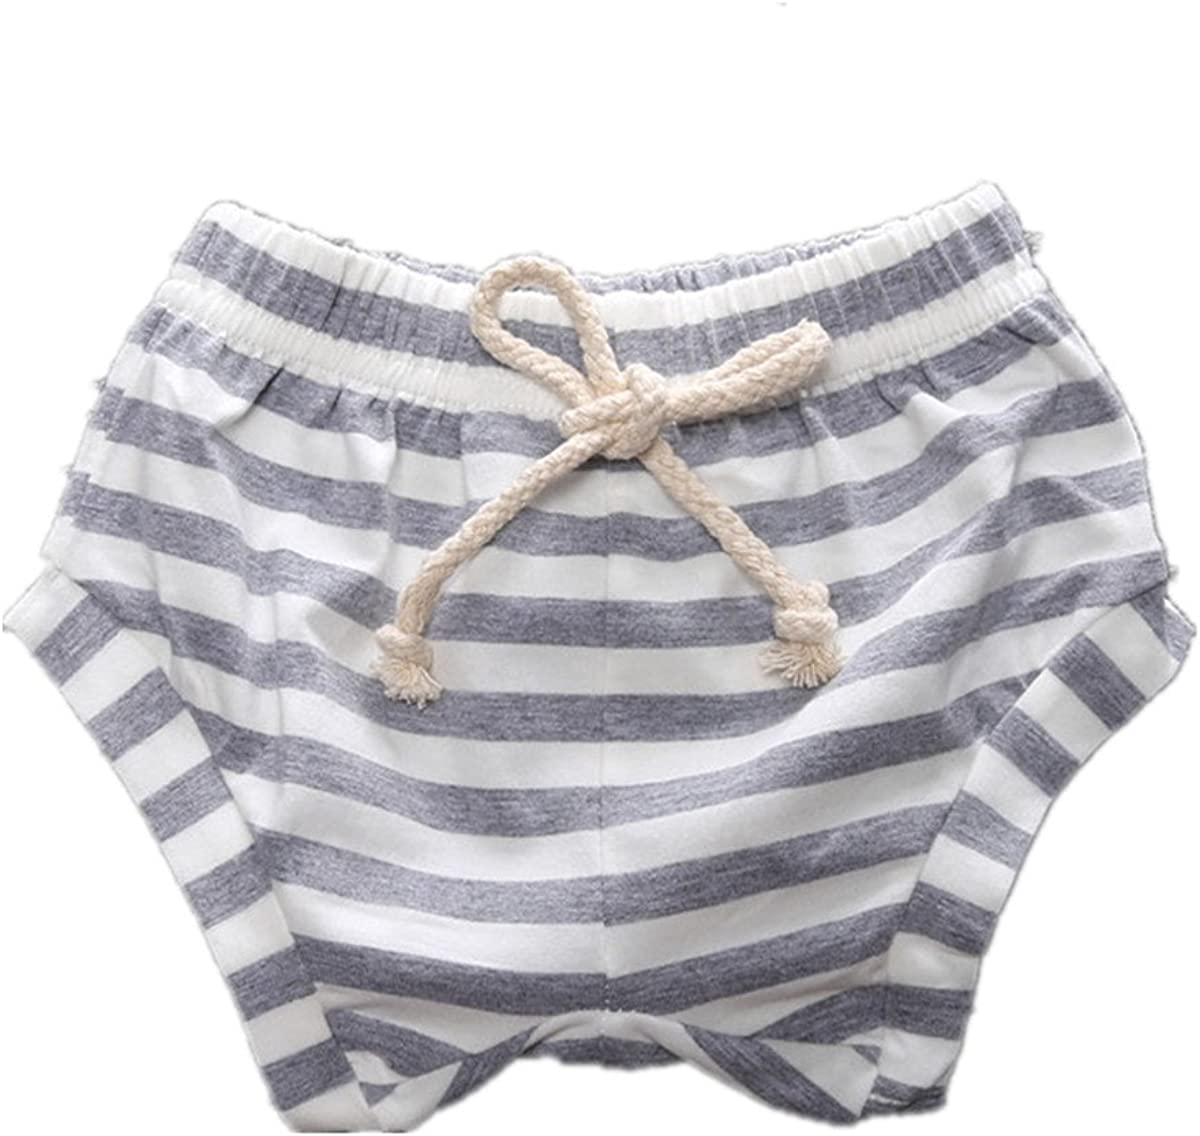 WINZIK Max 41% OFF Tulsa Mall Baby Kids Pants Striped Shorts Boy Waist Bloomers Elastic